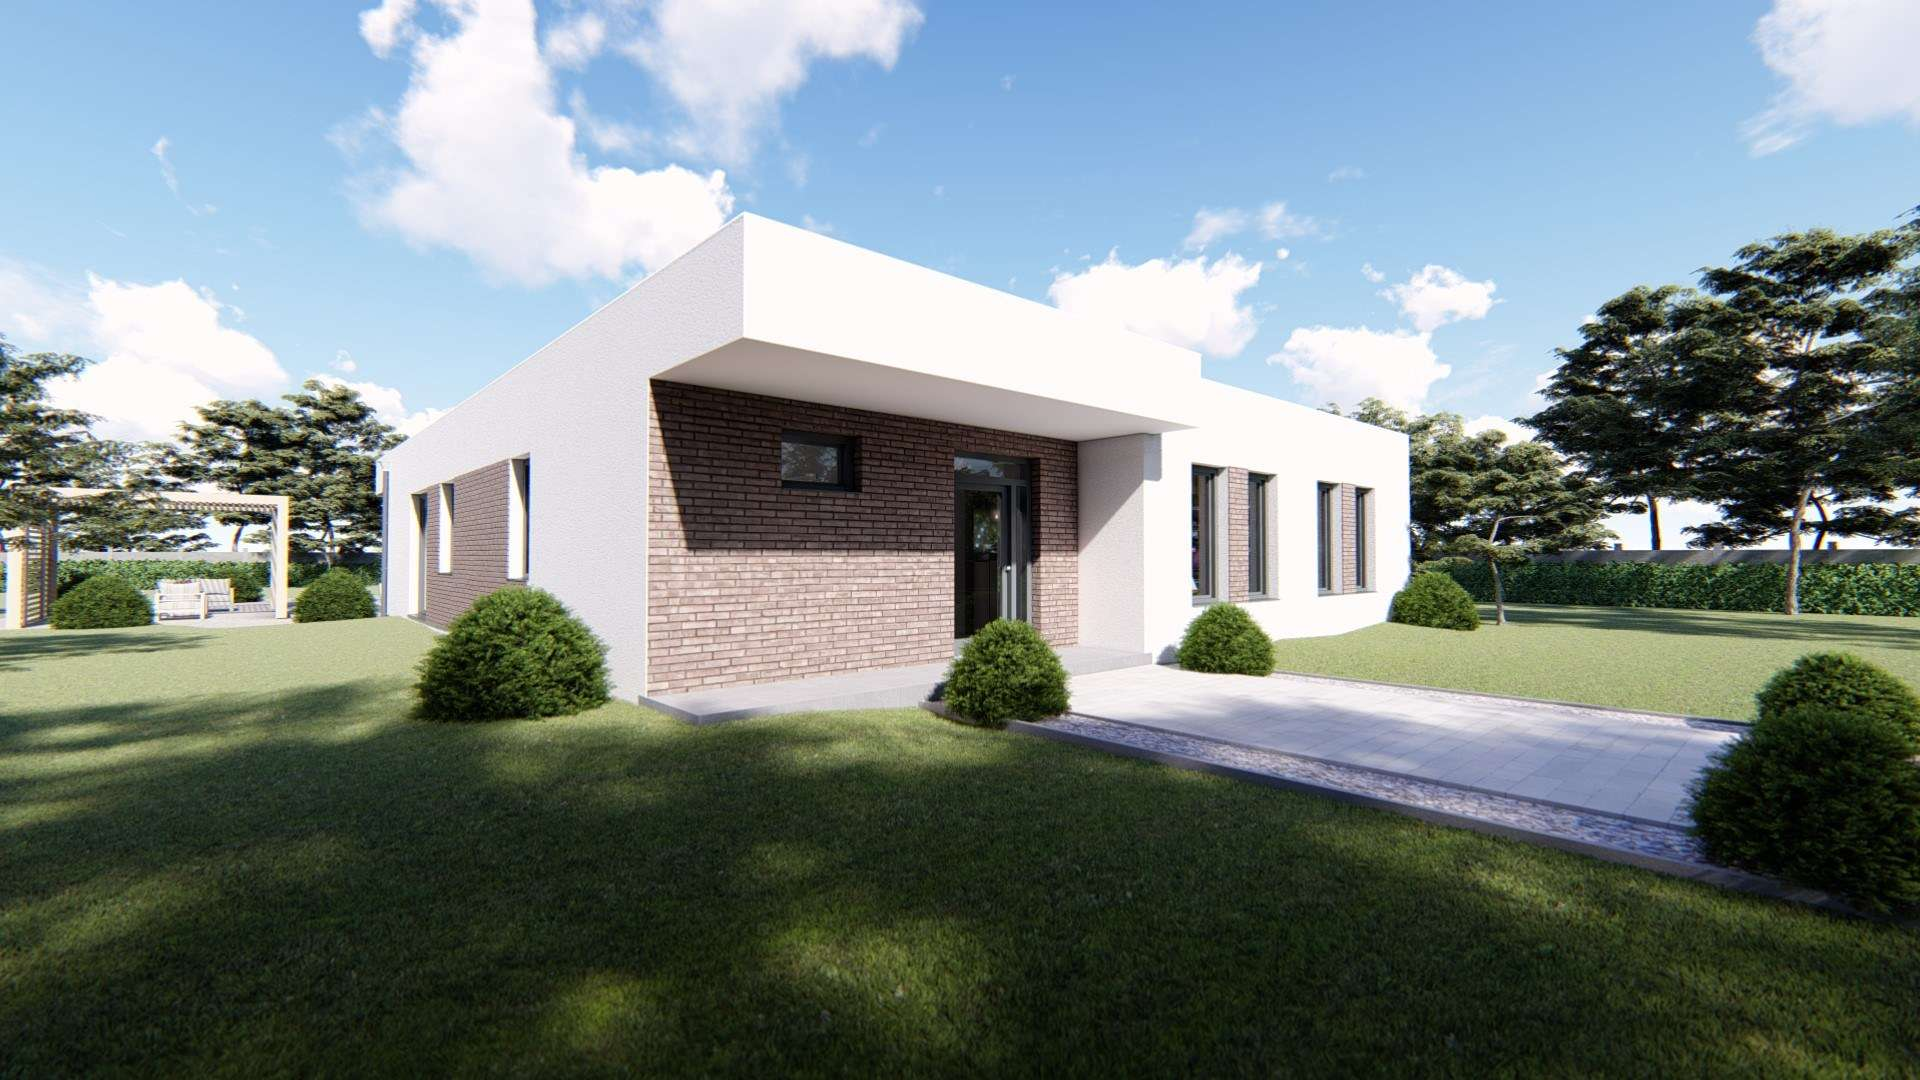 Projekt domu VESPERUM 4